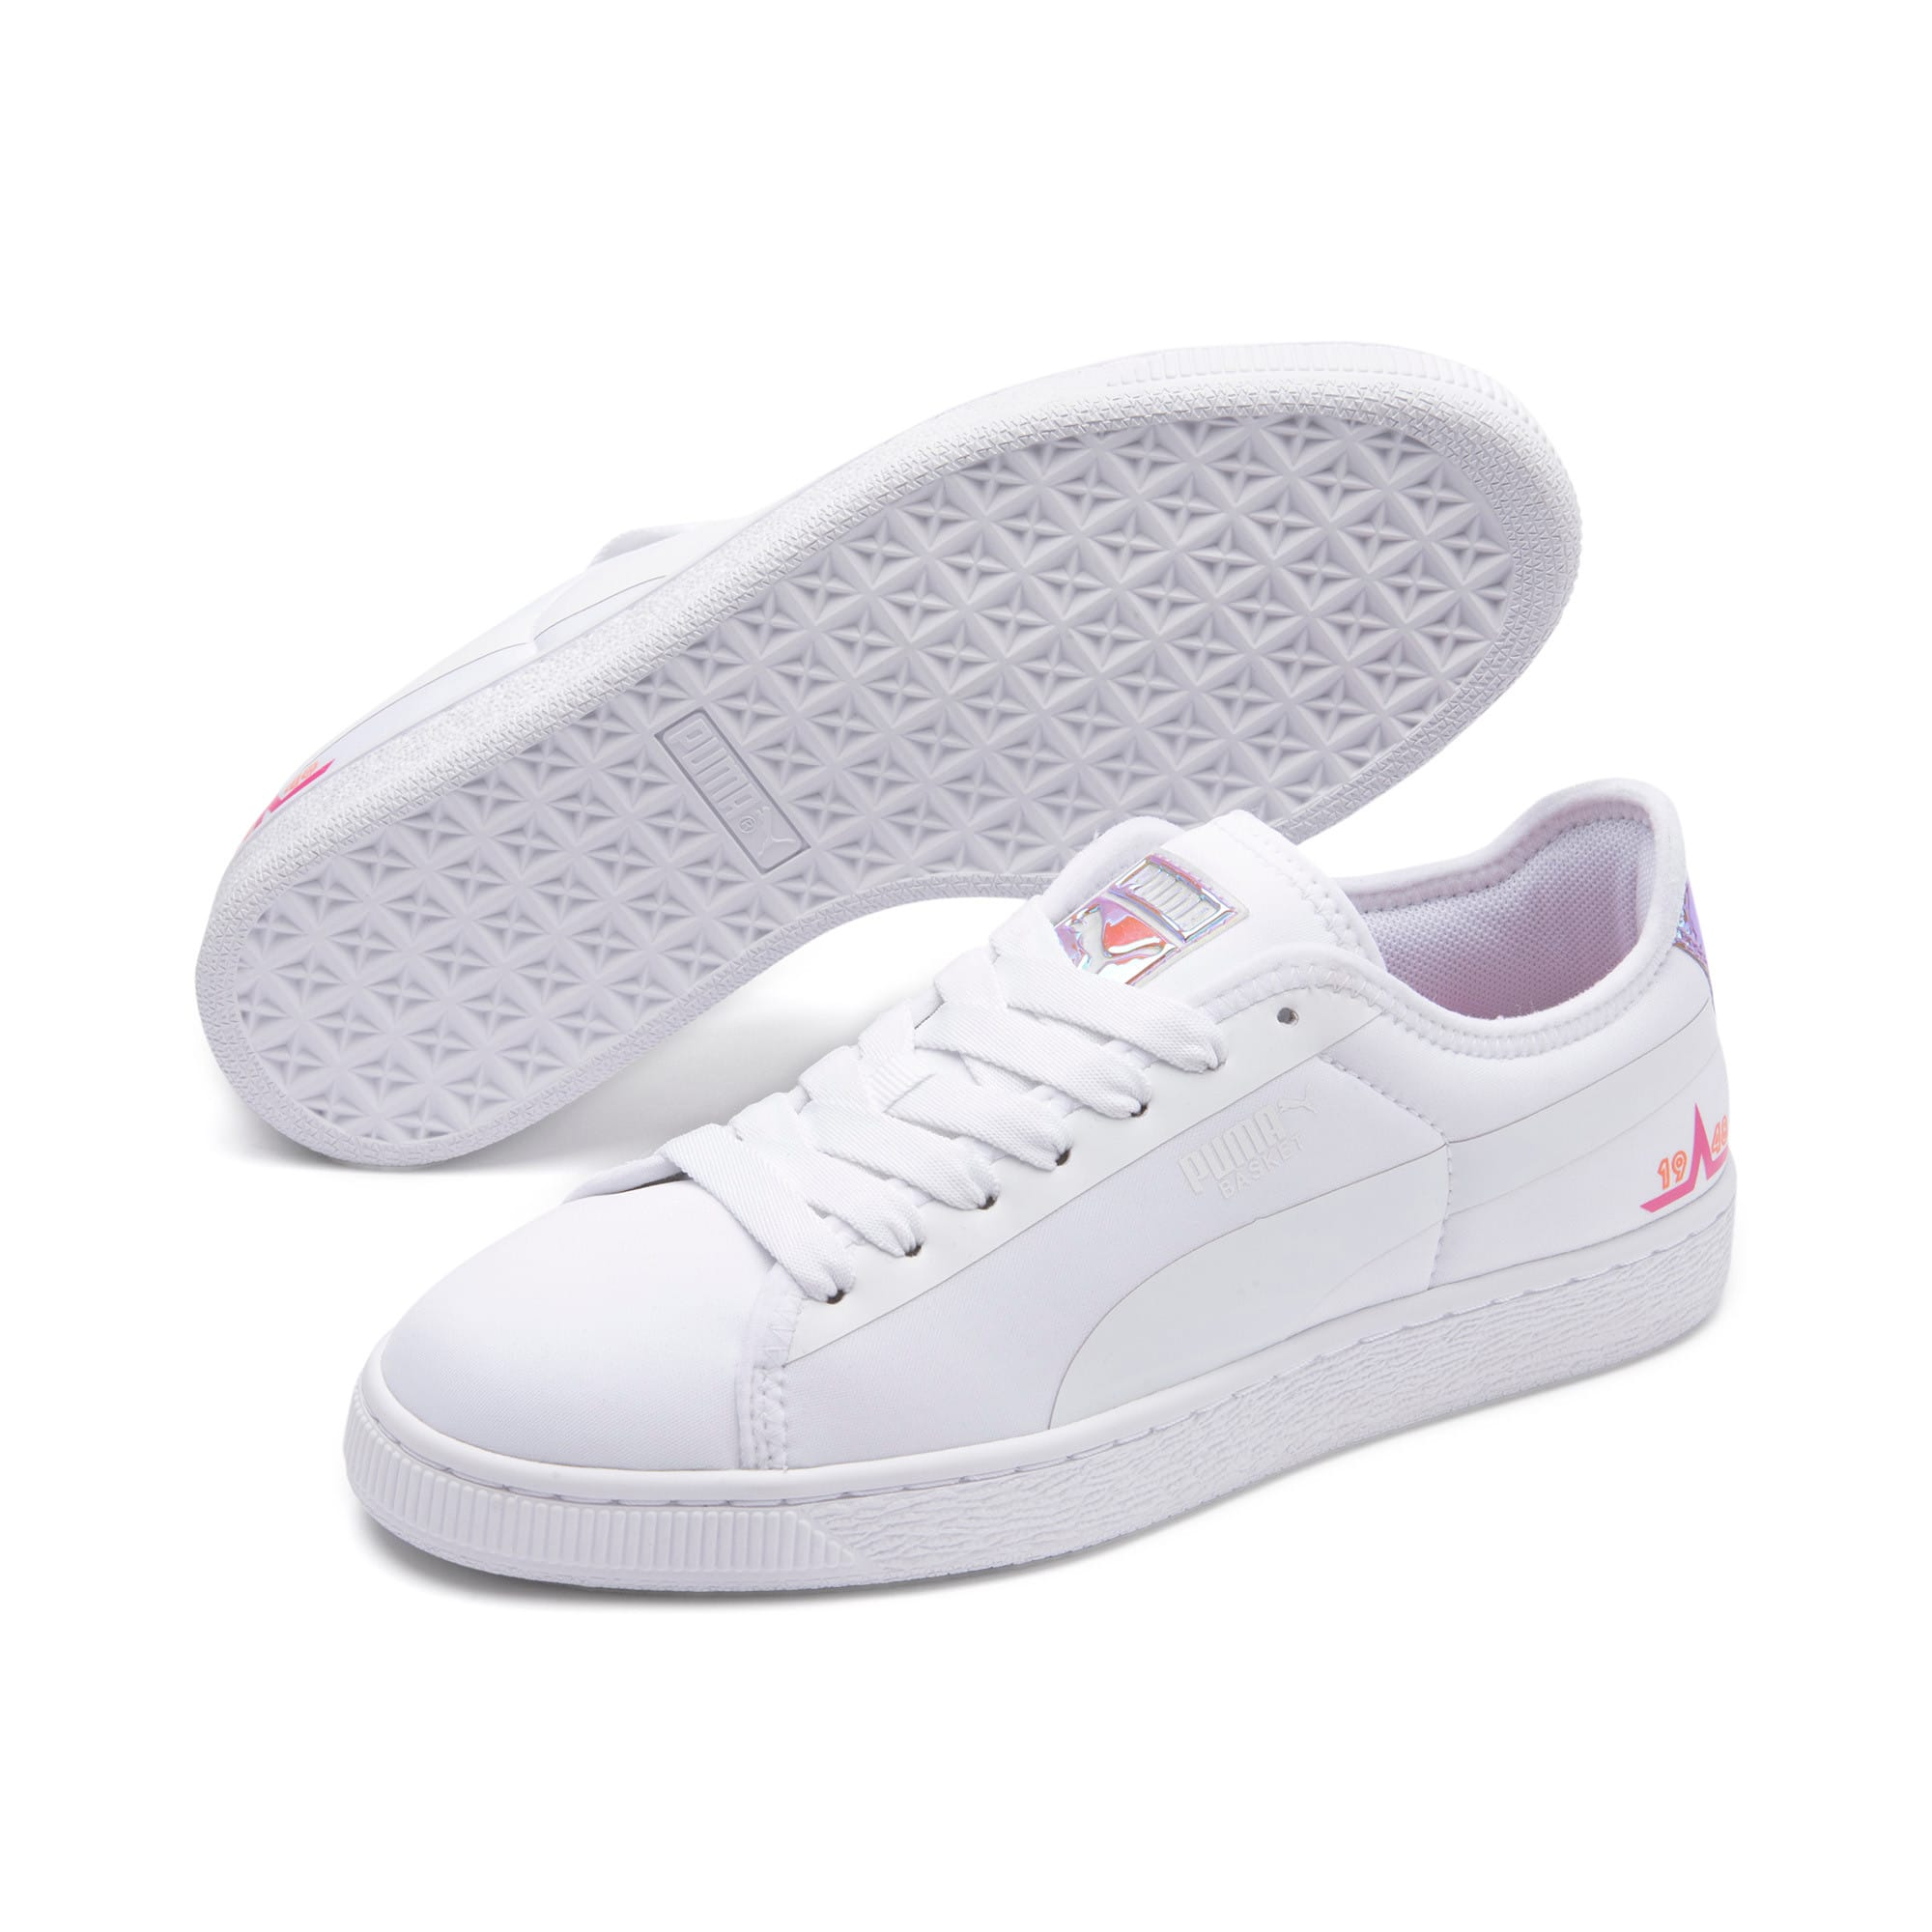 Miniatura 2 de Zapatos deportivos  Basket Trailblazerpara mujer, Puma White-Fuchsia Purple, mediano